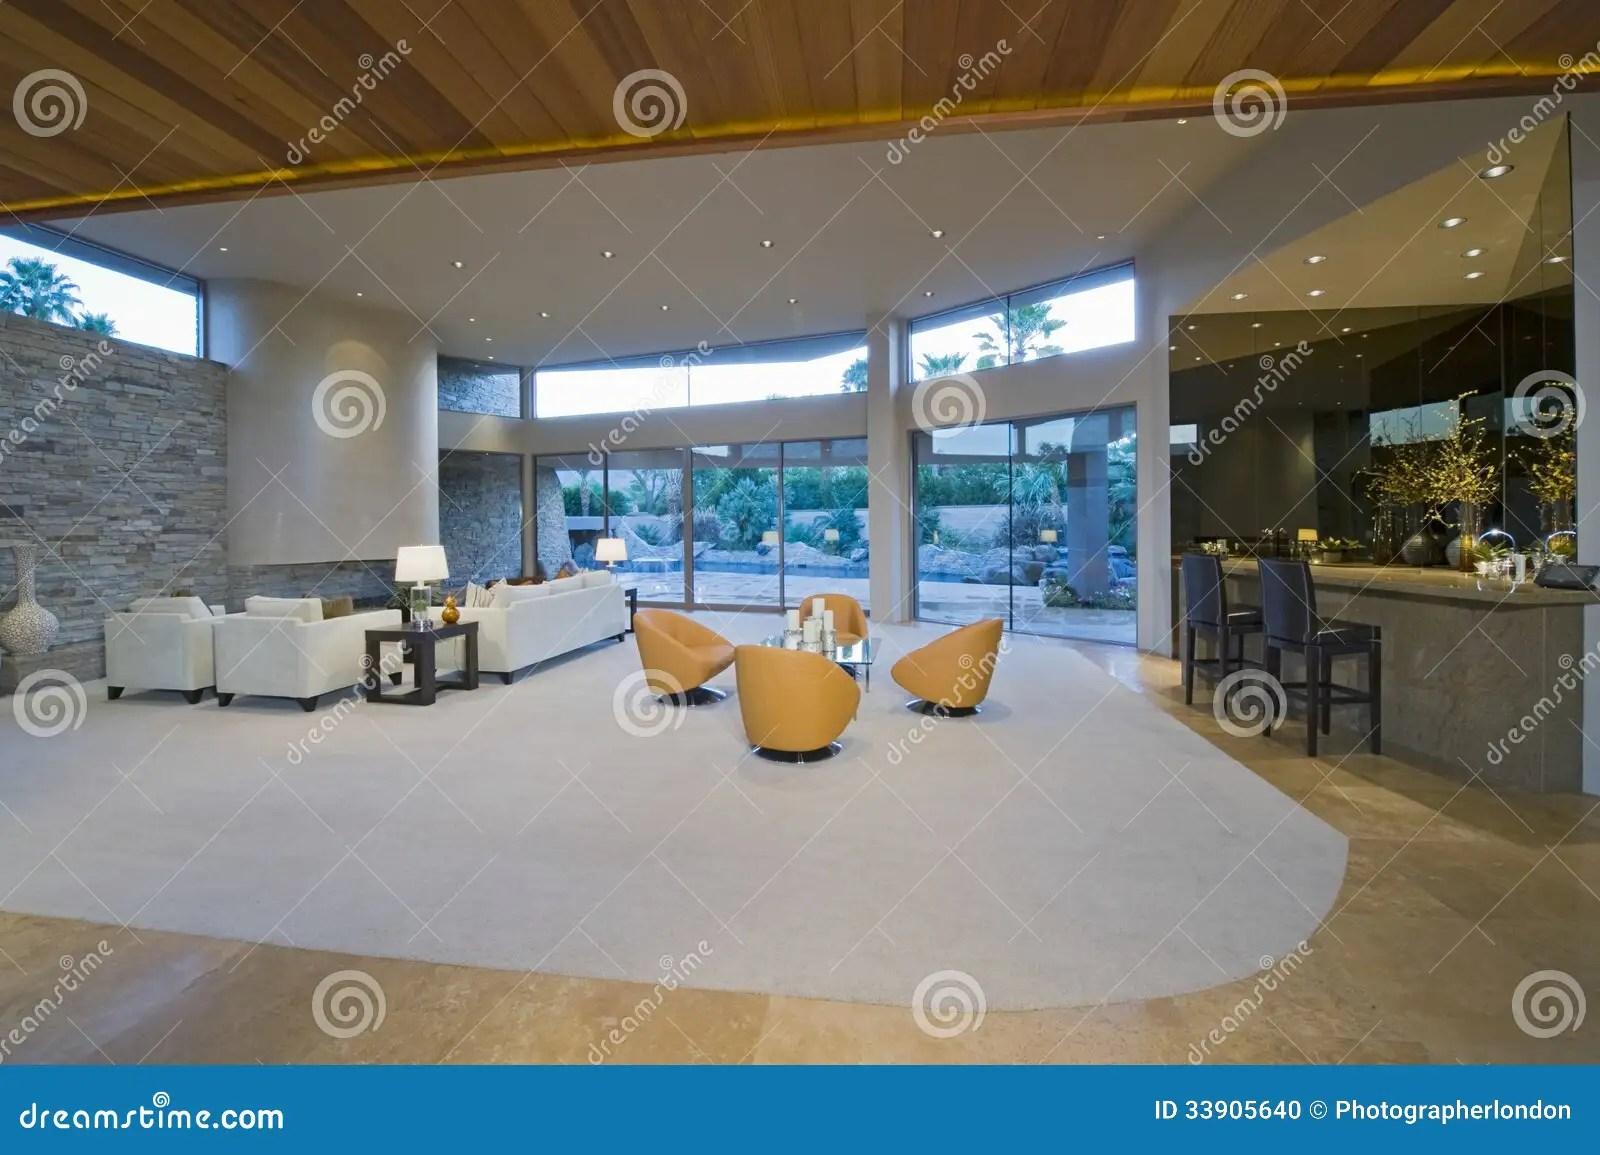 Living Room Furniture Less